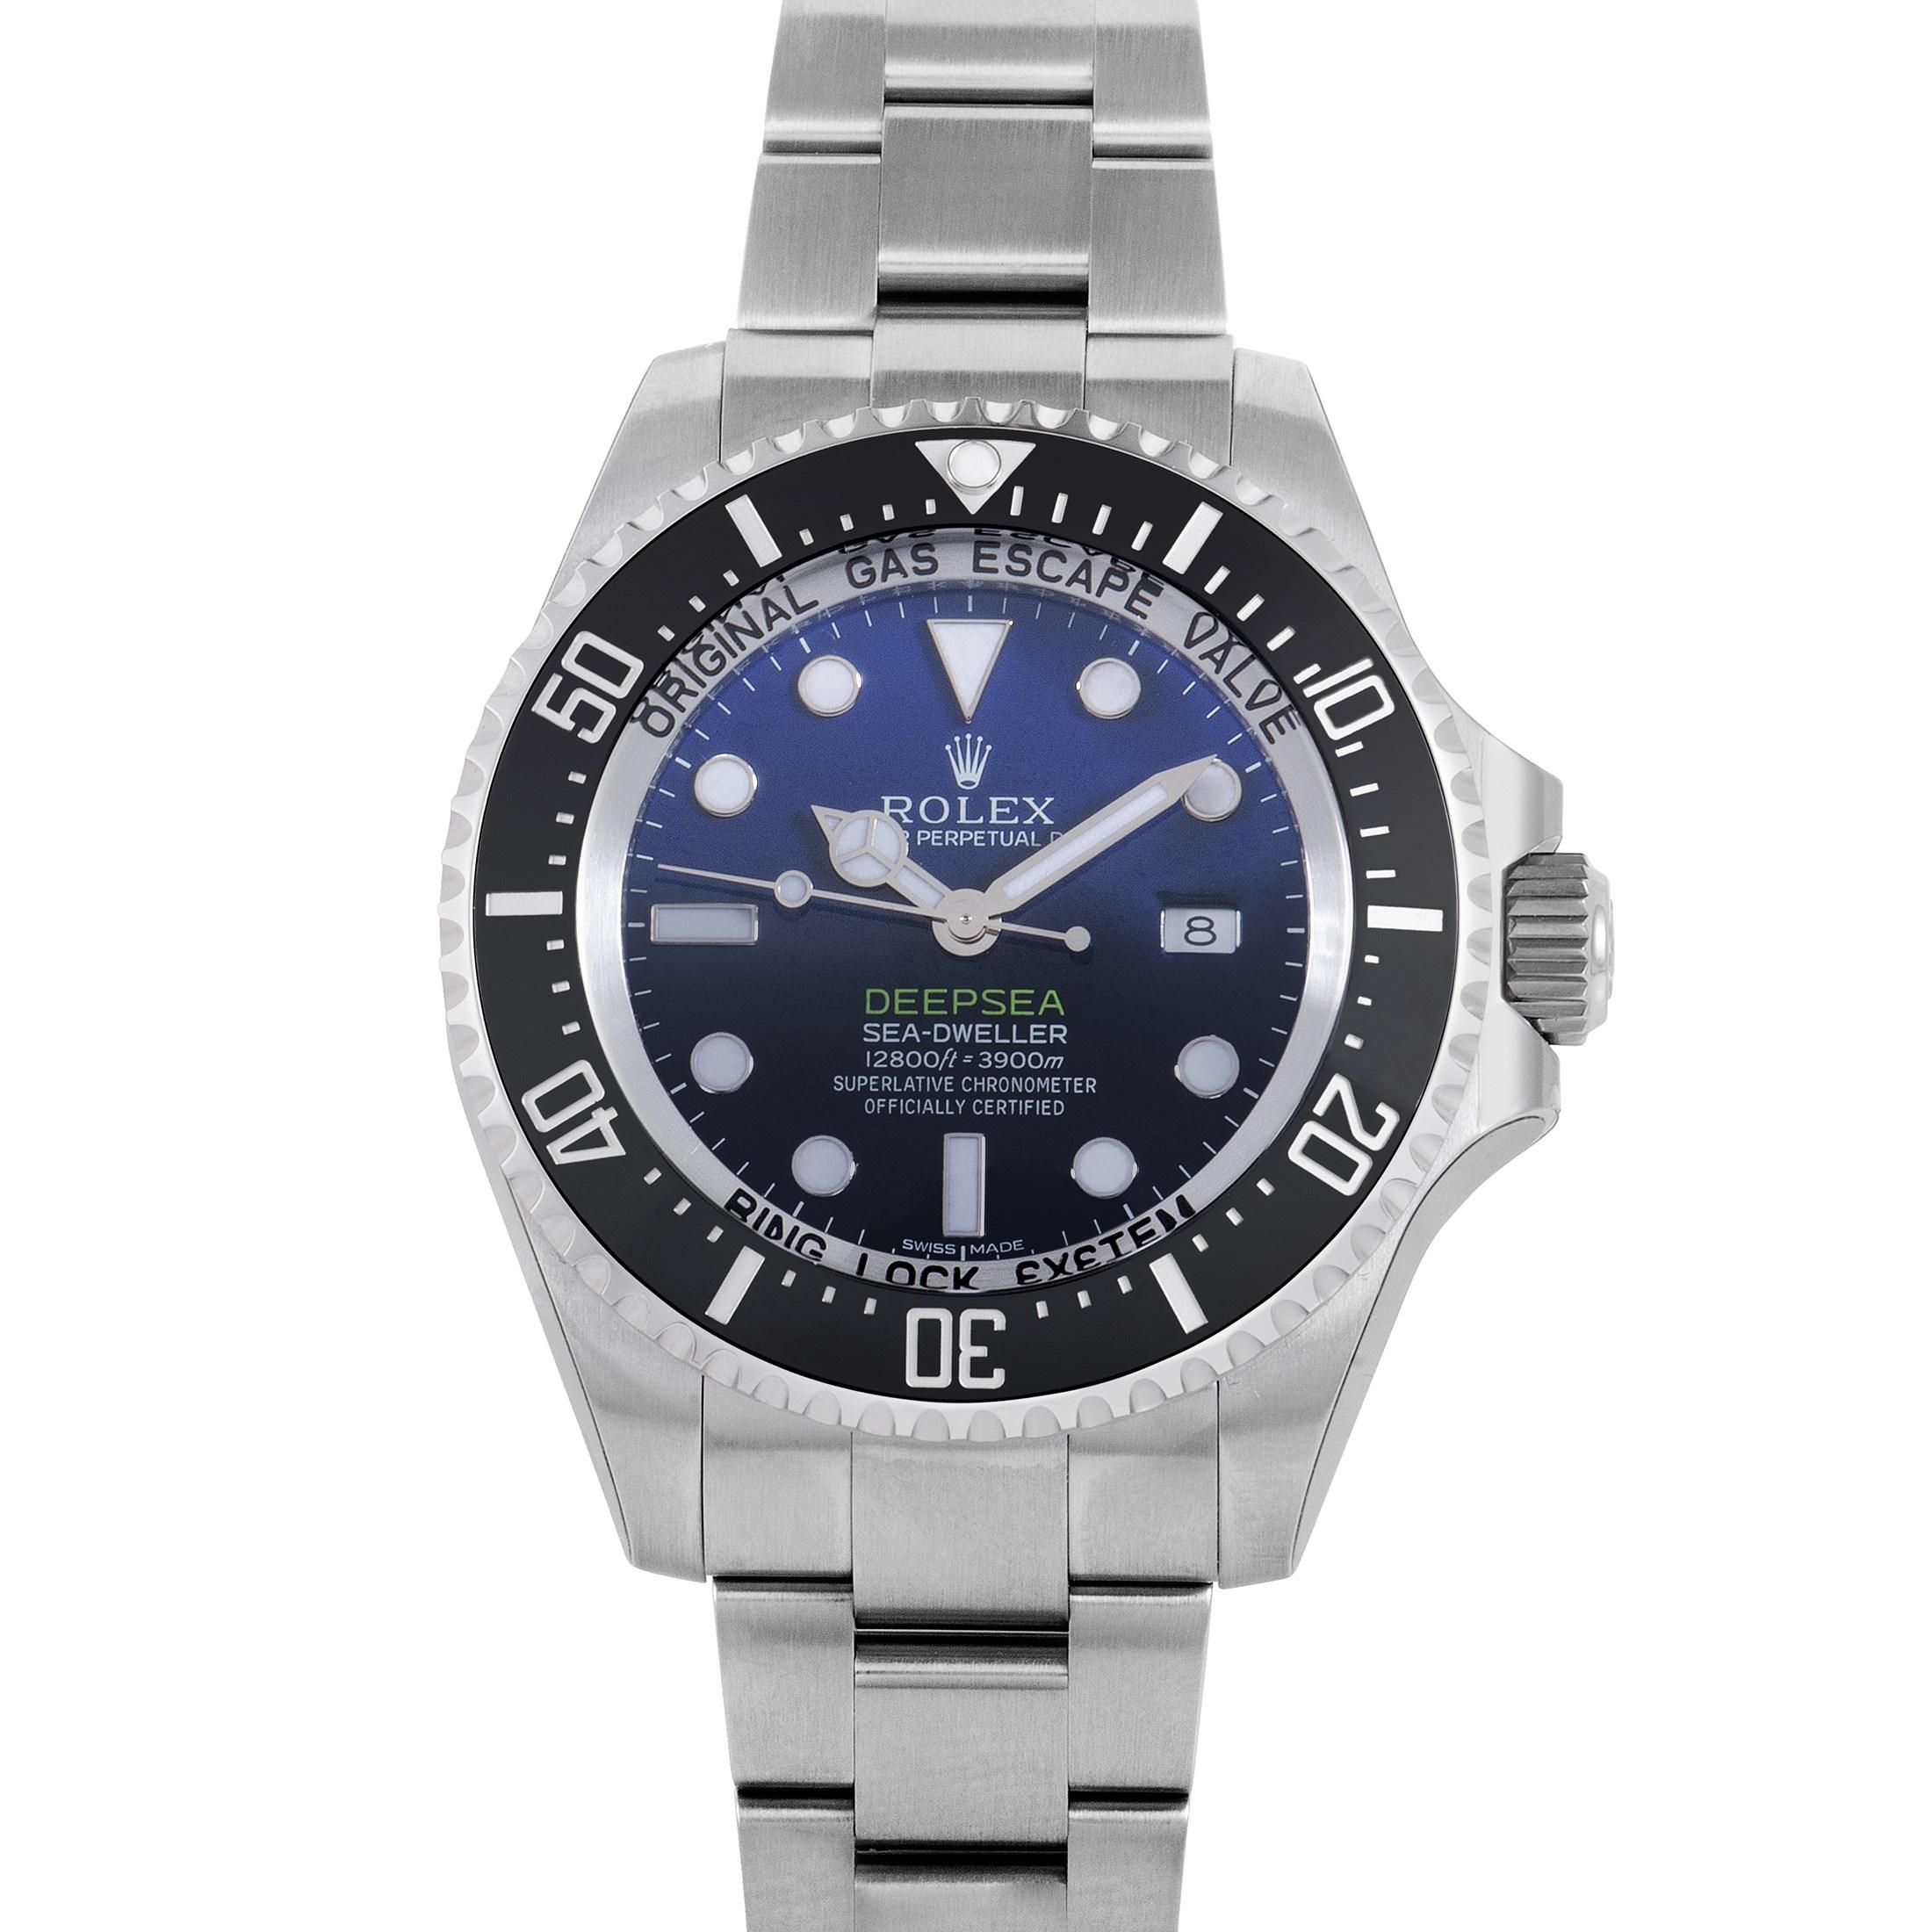 Oyster Perpetual Sea-Dweller DEEPSEA Mens Automatic Watch 116660 dbl